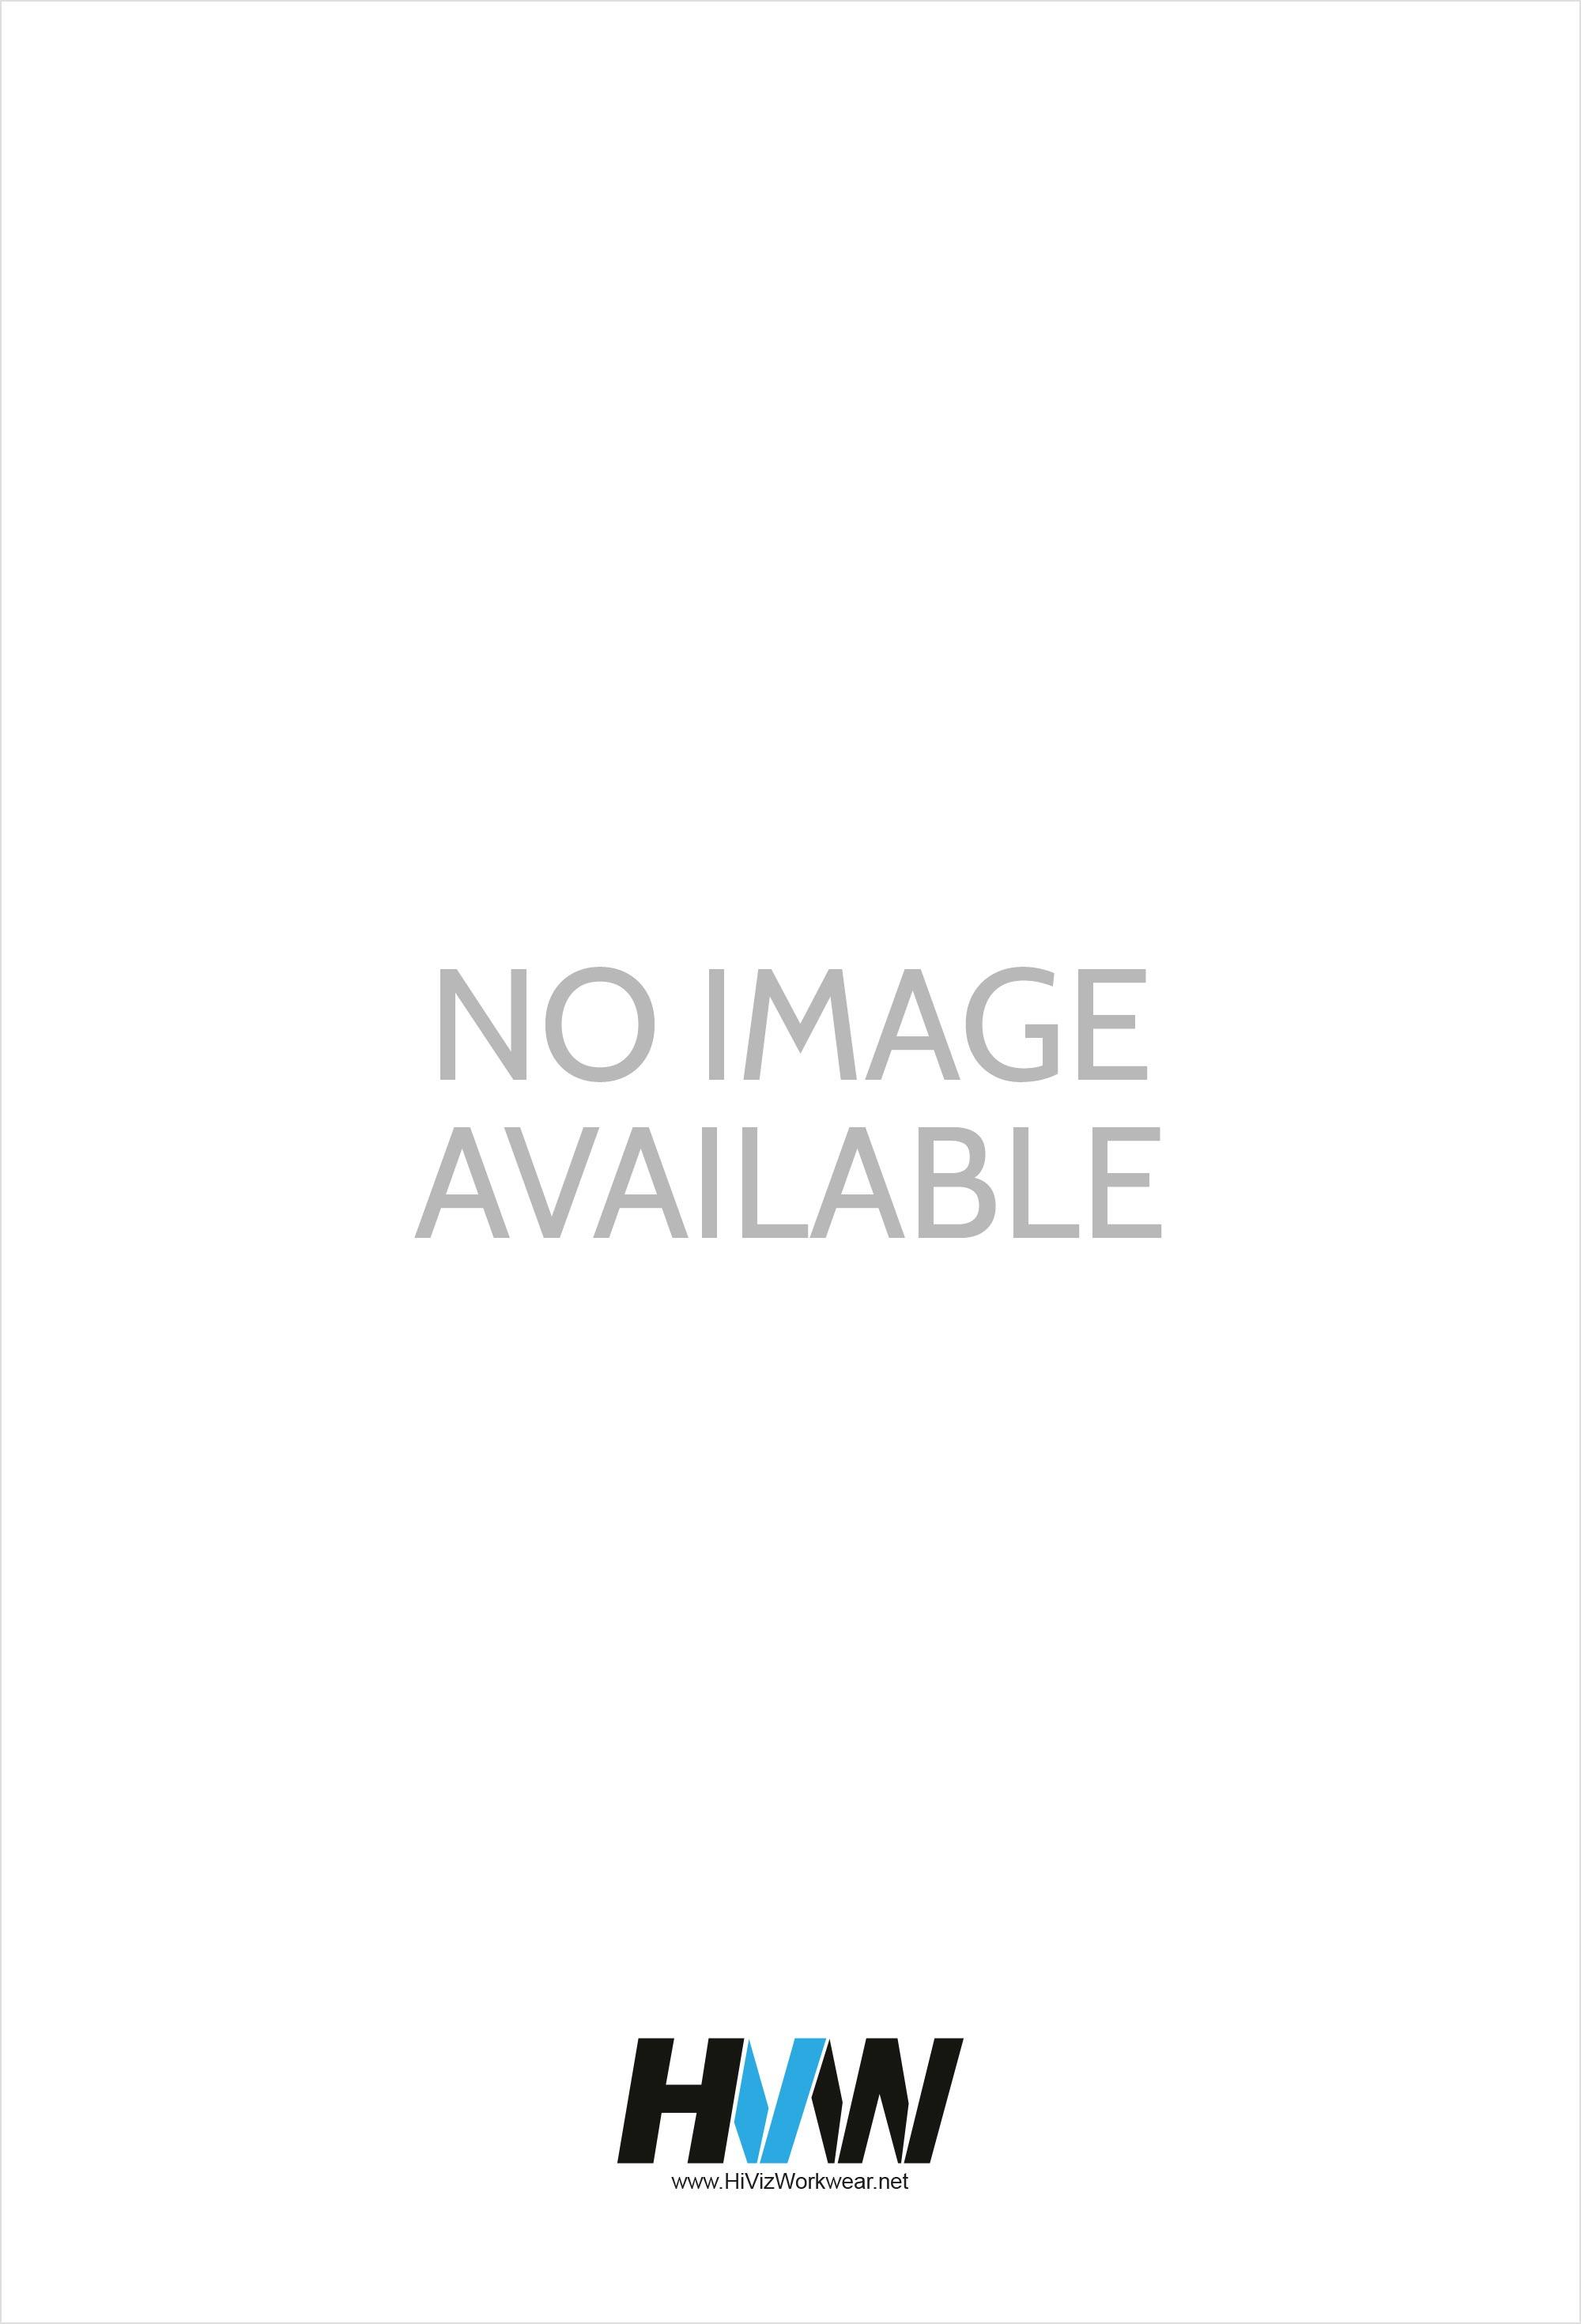 SS824 Premium 70/30 Hooded Sweatshirt